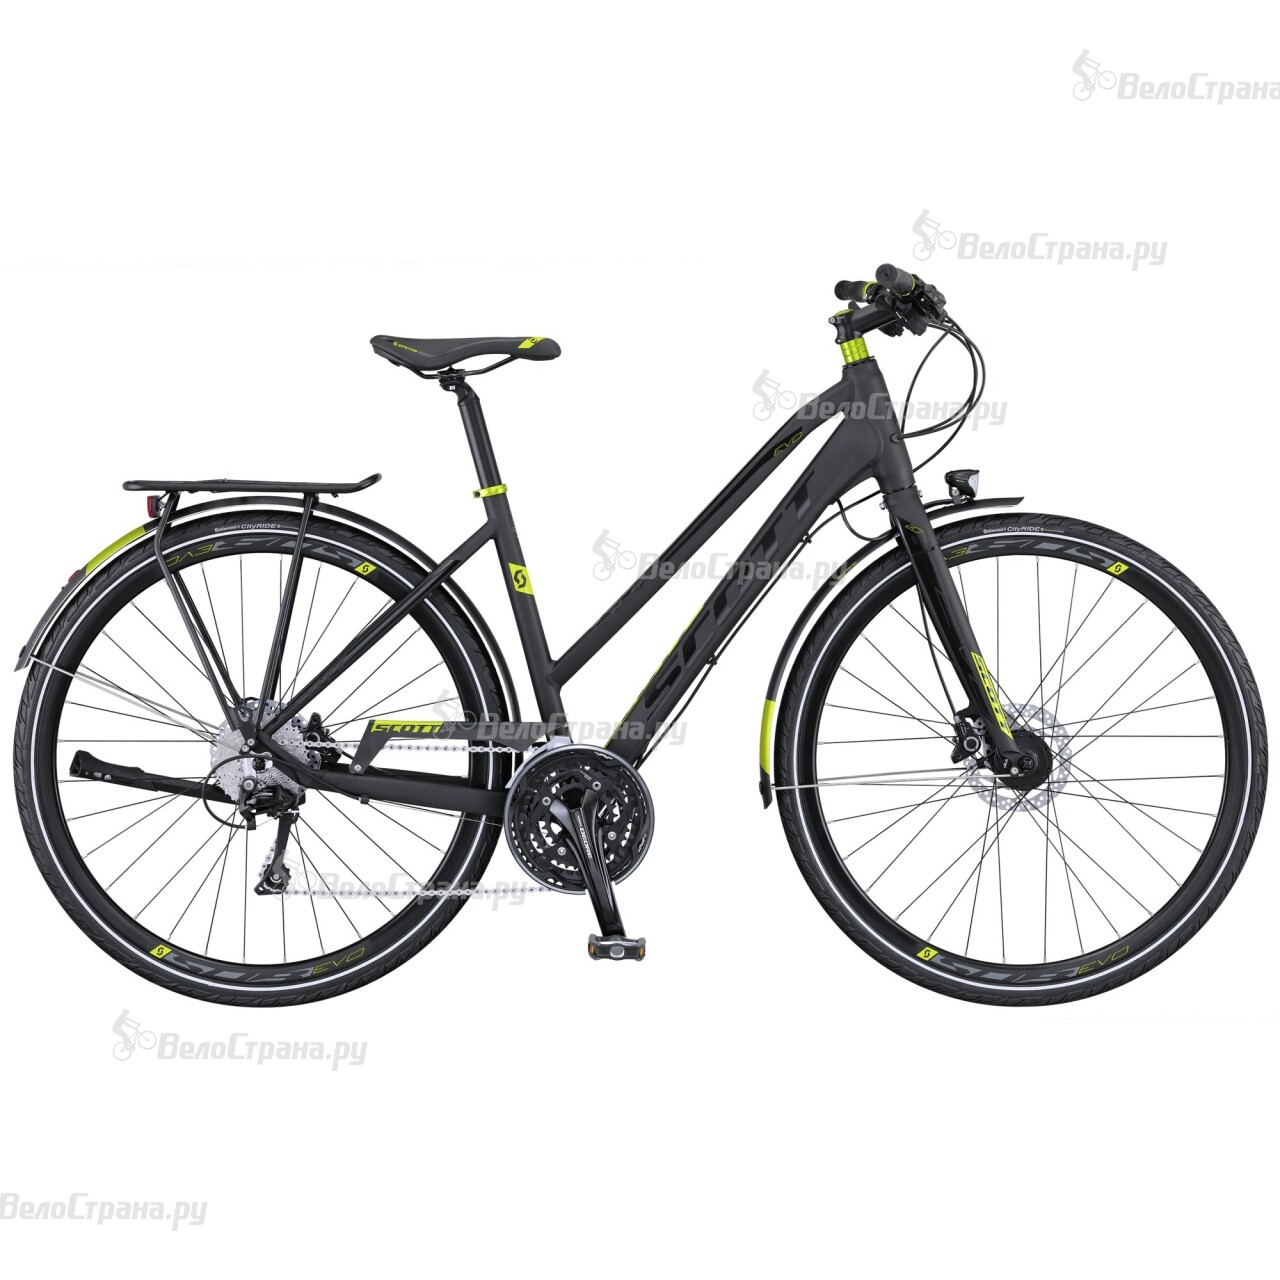 Велосипед Scott Sub Evo 20 Lady (2016) цены онлайн